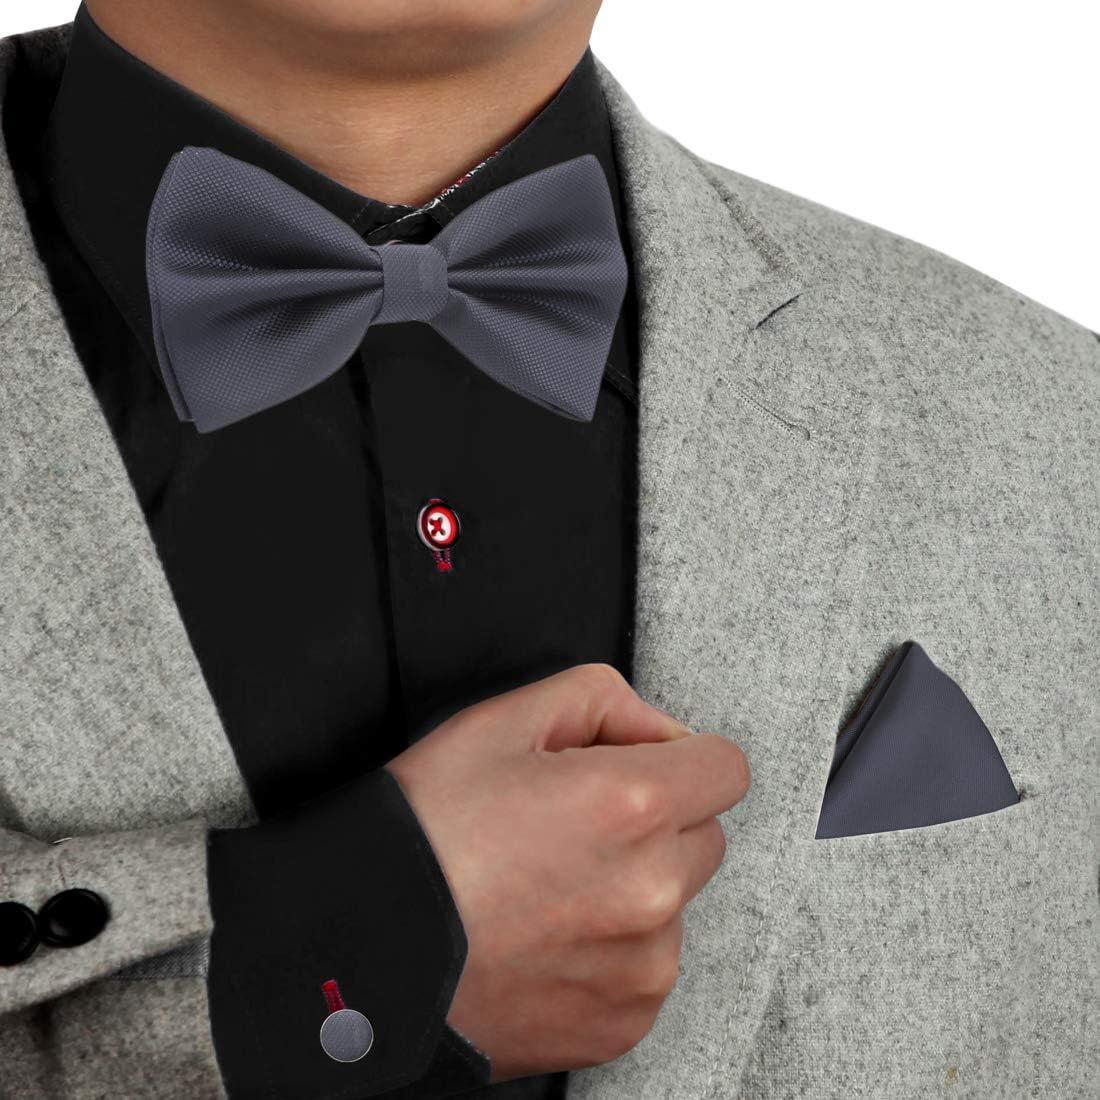 Dan Smith C.C.O.M.007 Black Bow Ties Trendy Microfiber Pre-tied Bow Tie Cufflinks Hanky Set